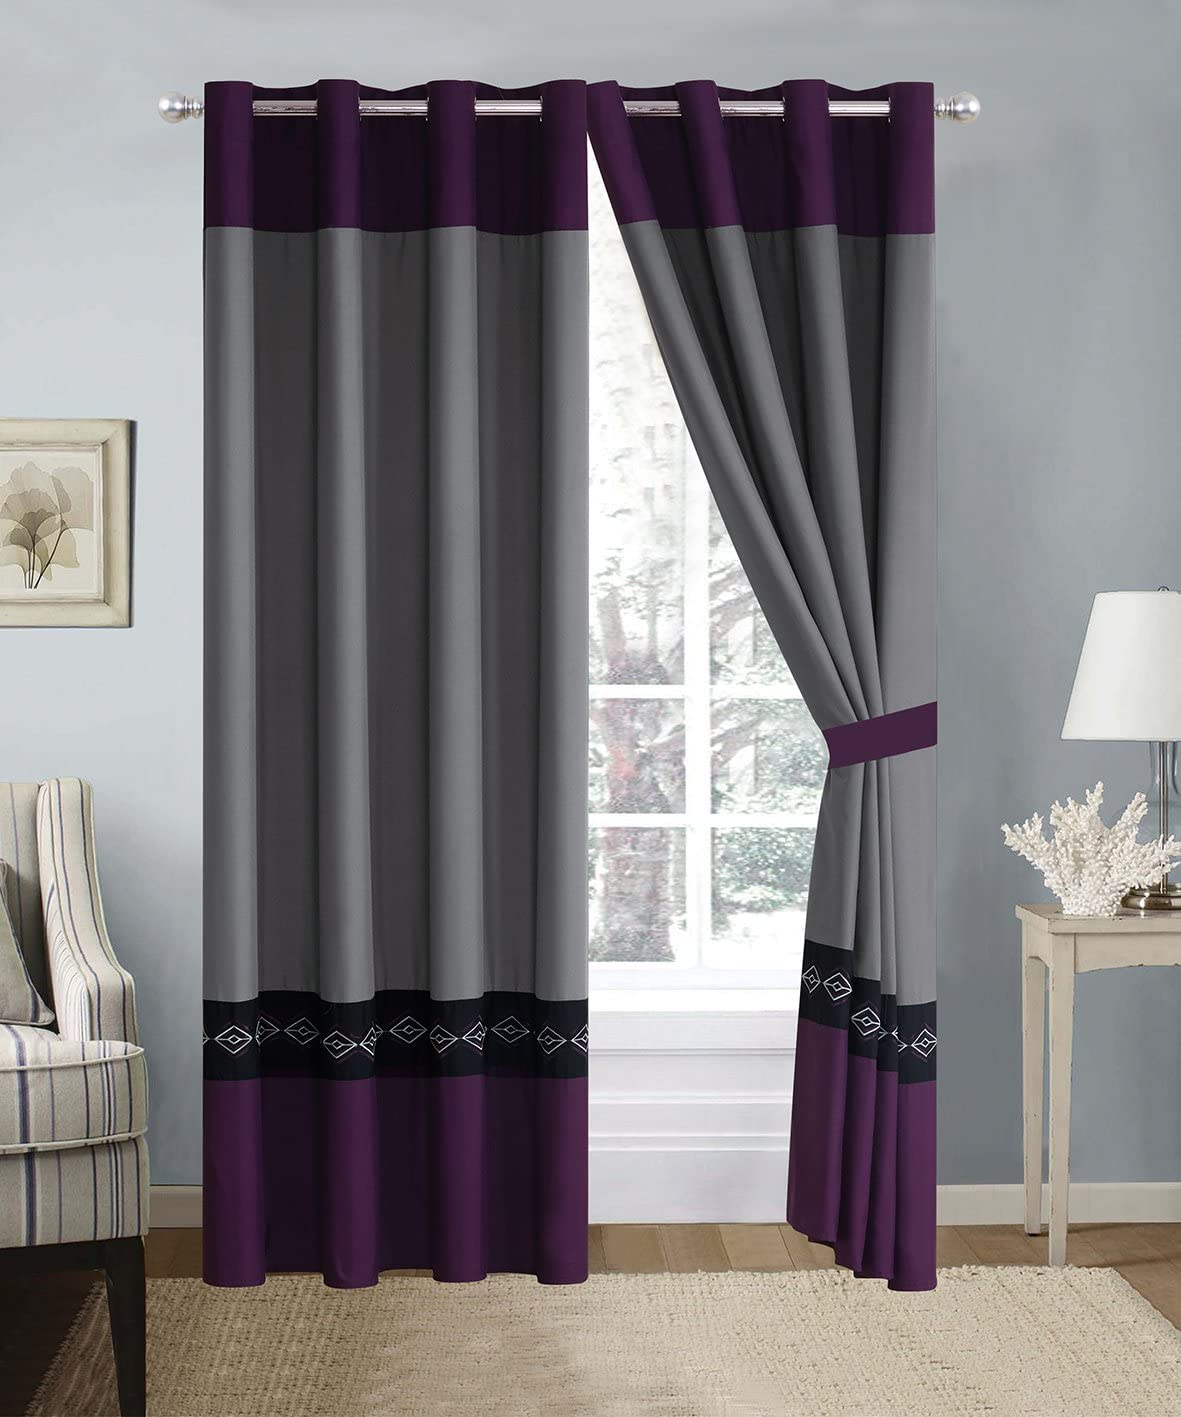 4 Piece Dark Purple/Grey/Black Double-Needle Stitch Pinch Pleat Grommet Window Curtain Set 108 x 84-inch